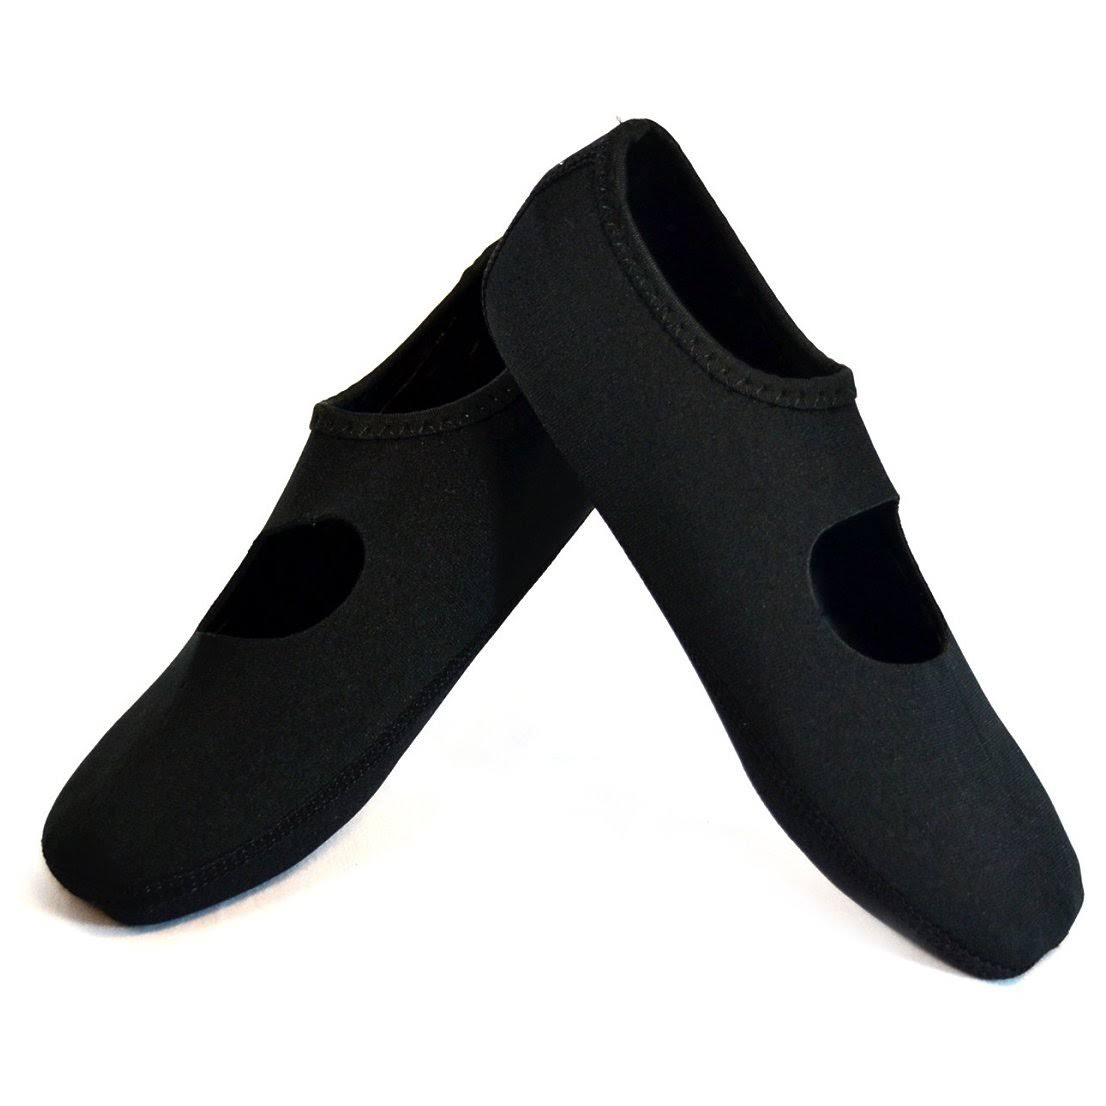 Dots Nufoot Flats Large Black Black Large Dots Nufoot ZuXTwlPkiO